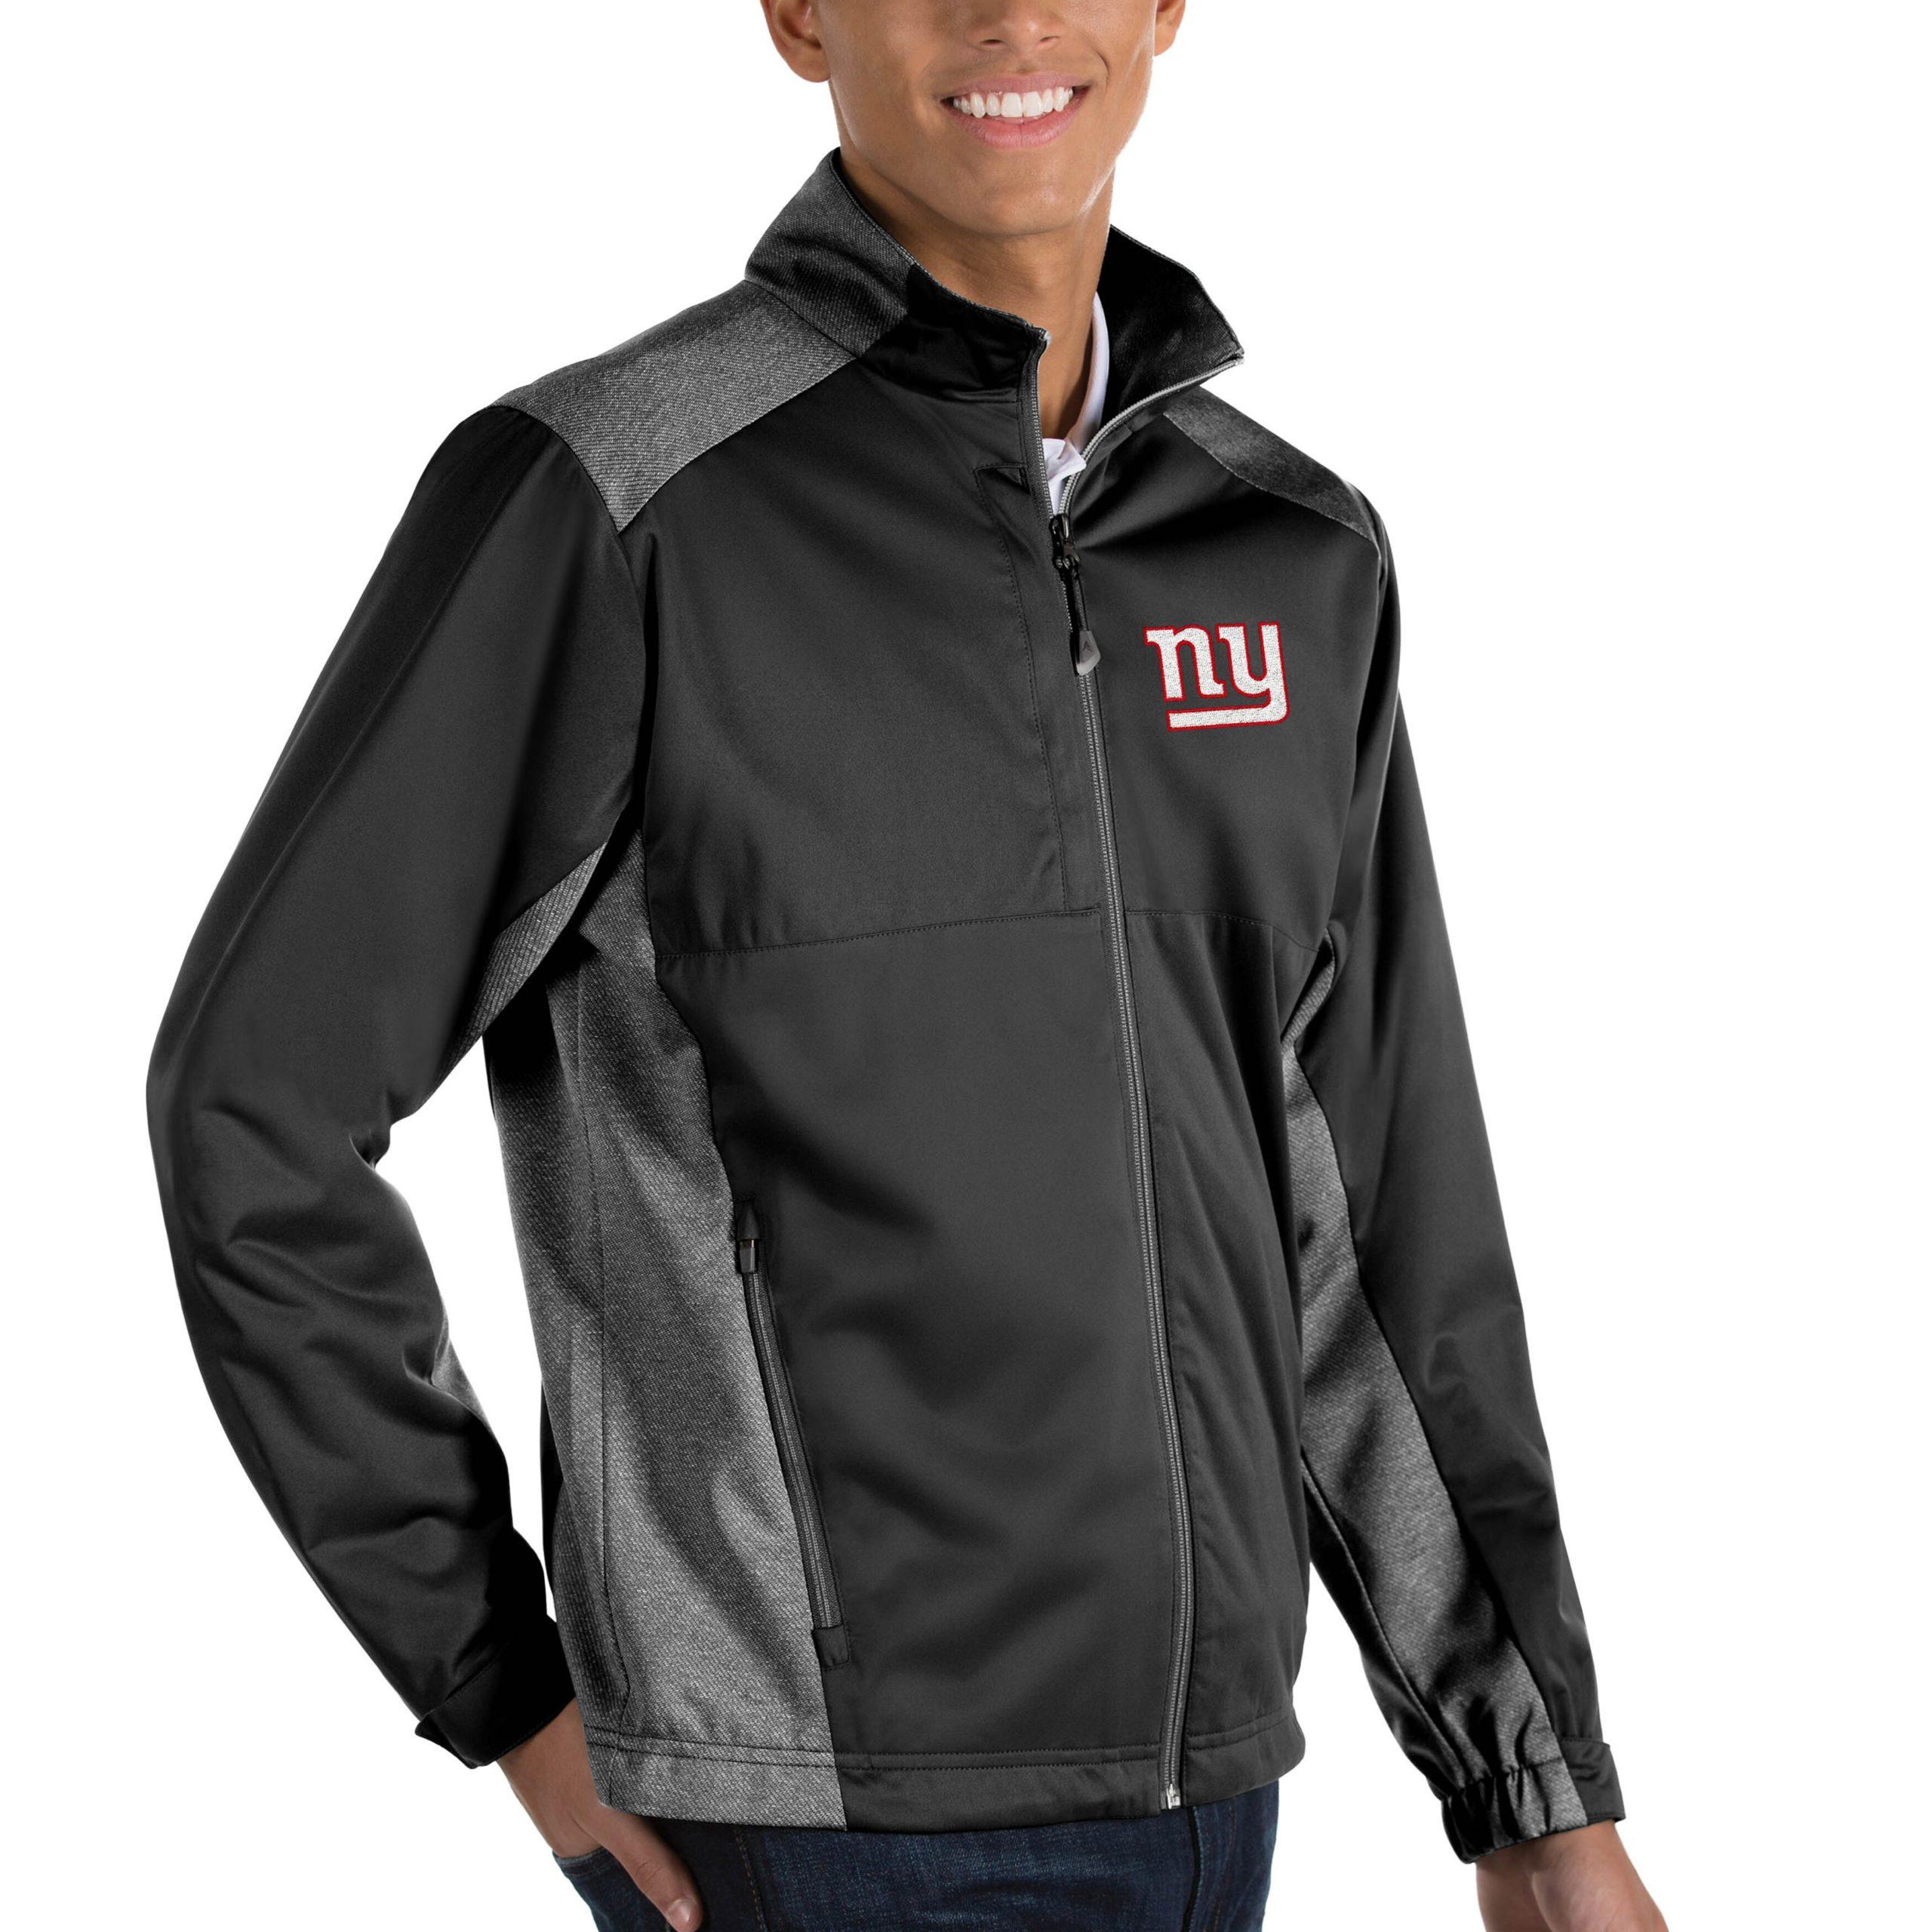 New York Giants Antigua Revolve Big & Tall Full-Zip Jacket - Heather Black